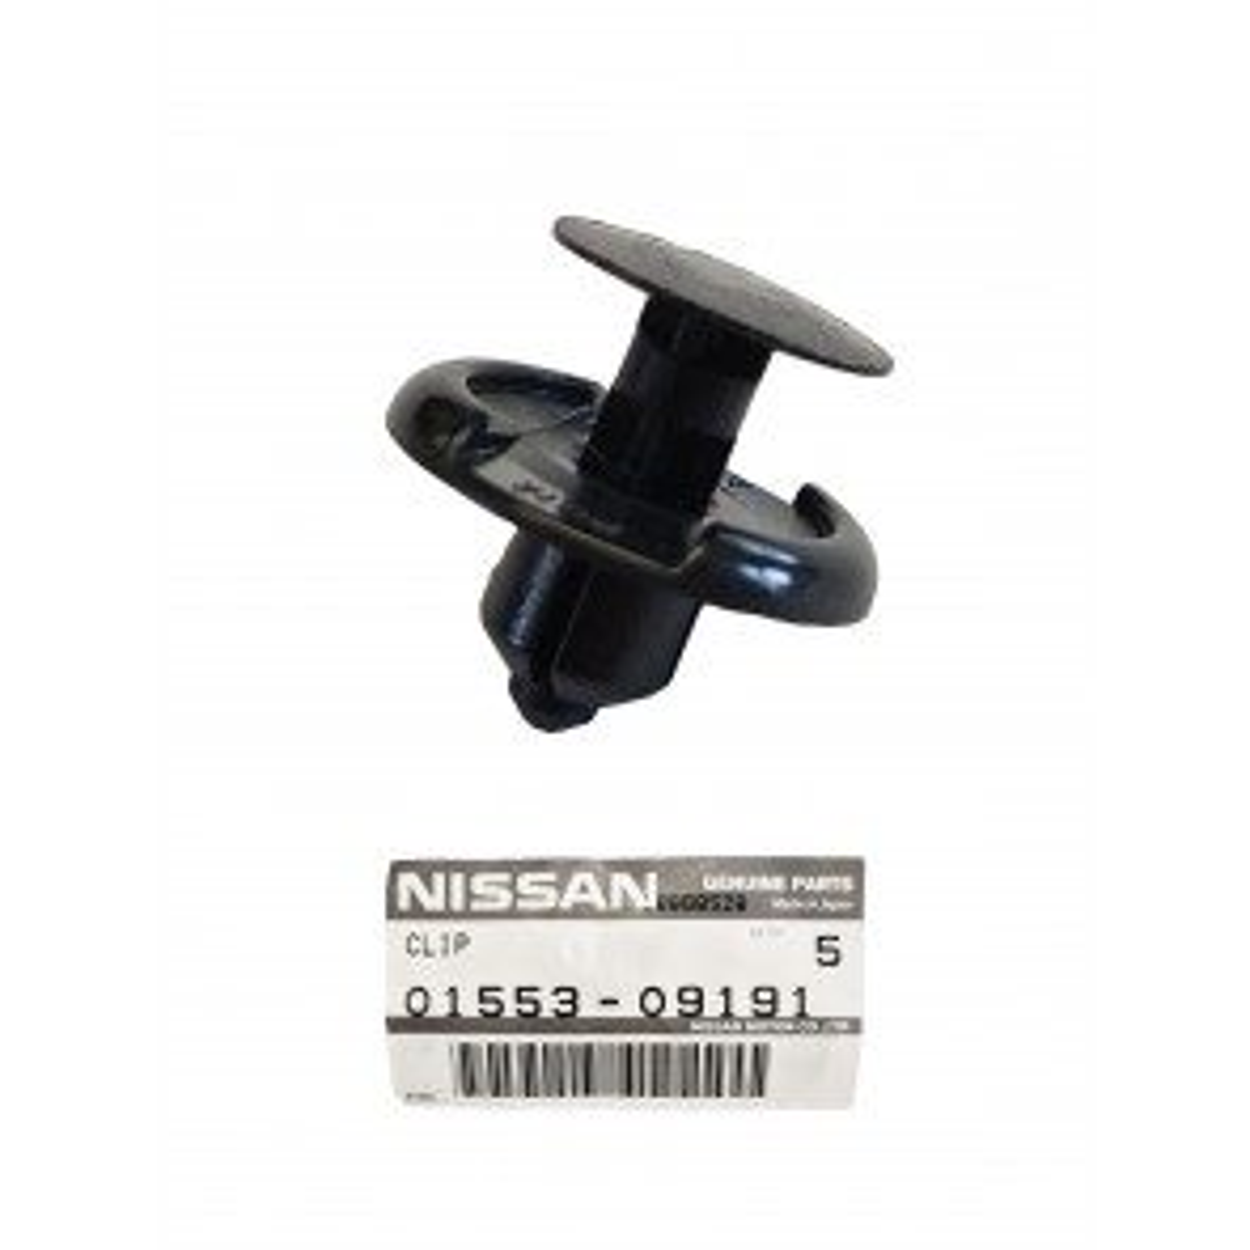 Genuine Nissan OEM Arch Liner Plastic Clip For Skyline R33 GTST GTR 01553-09191